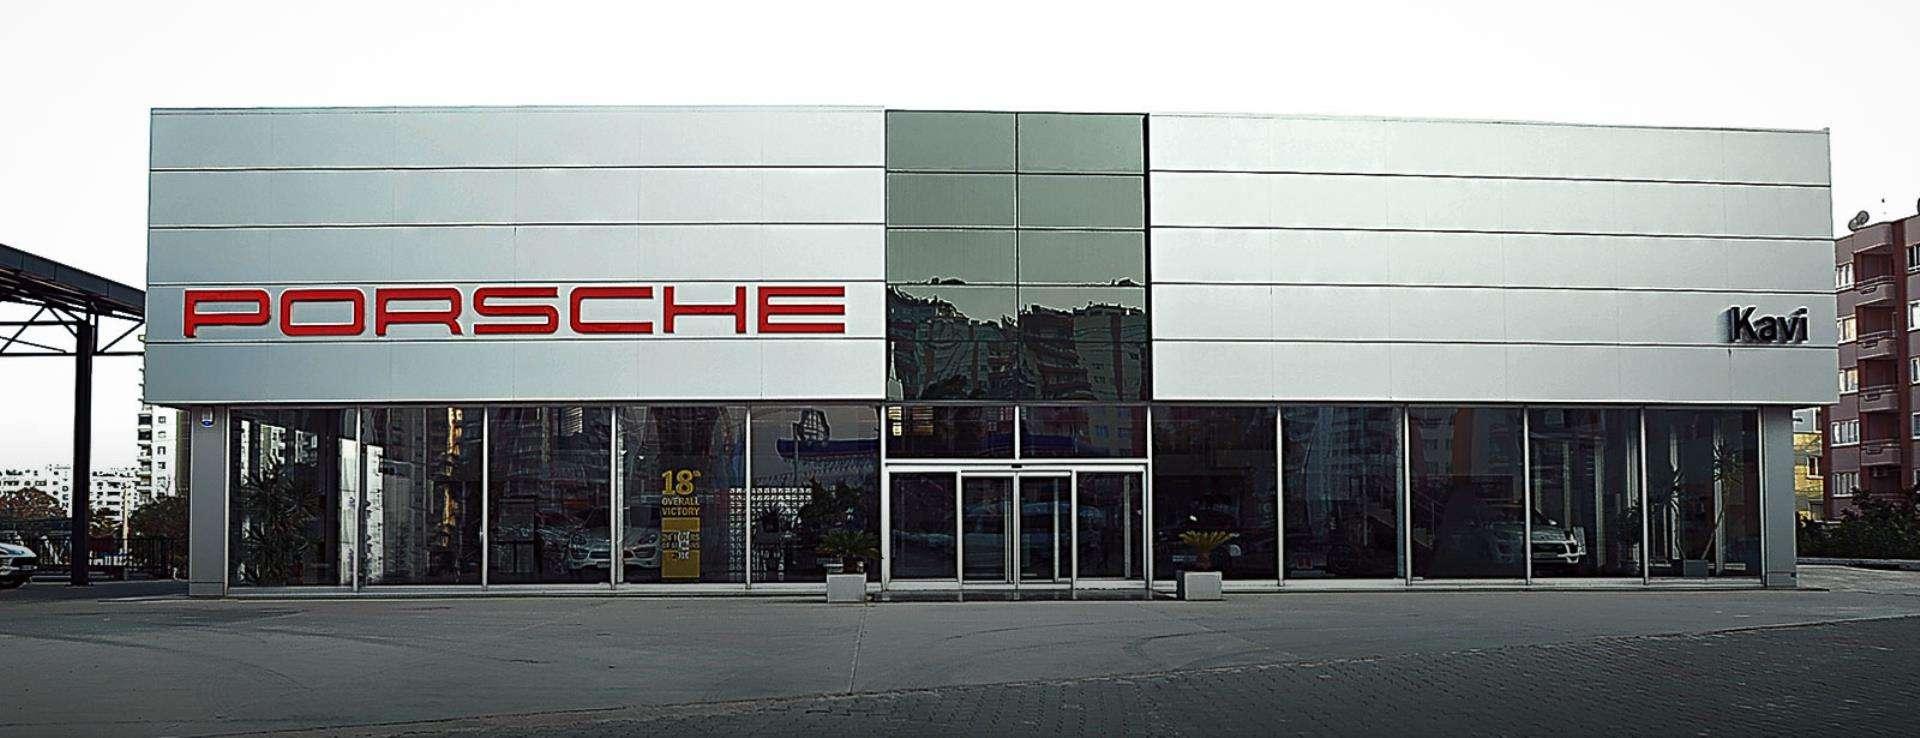 Porsche - Kavi Otomotiv Porsche